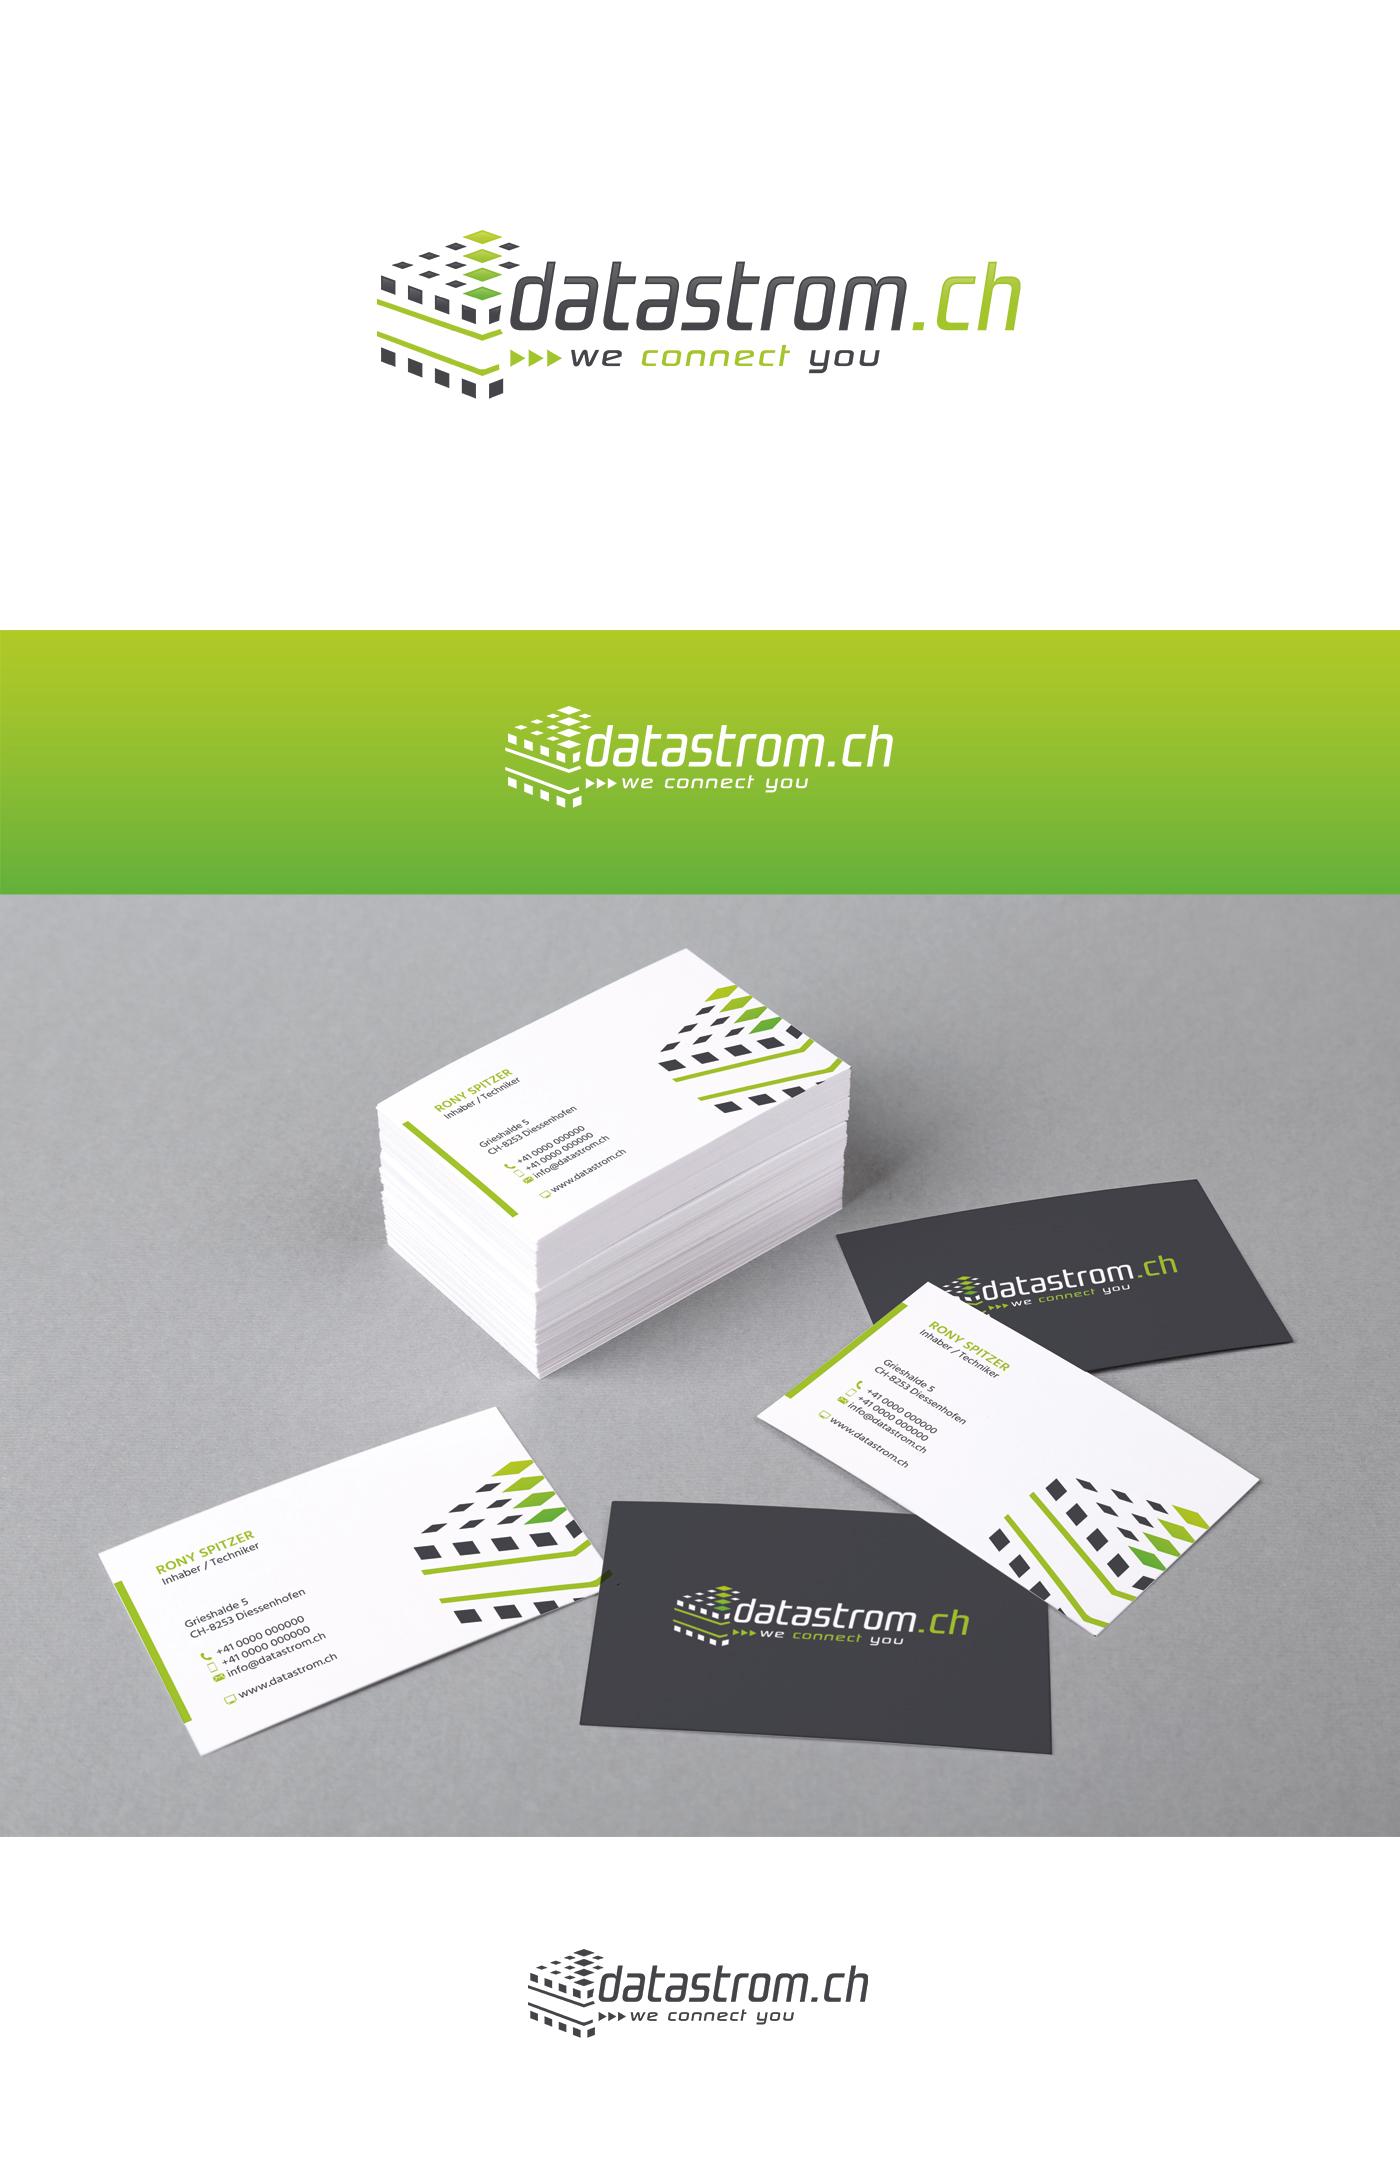 Logo Visitenkarte Für Datastrom Ch Noc Logo Business